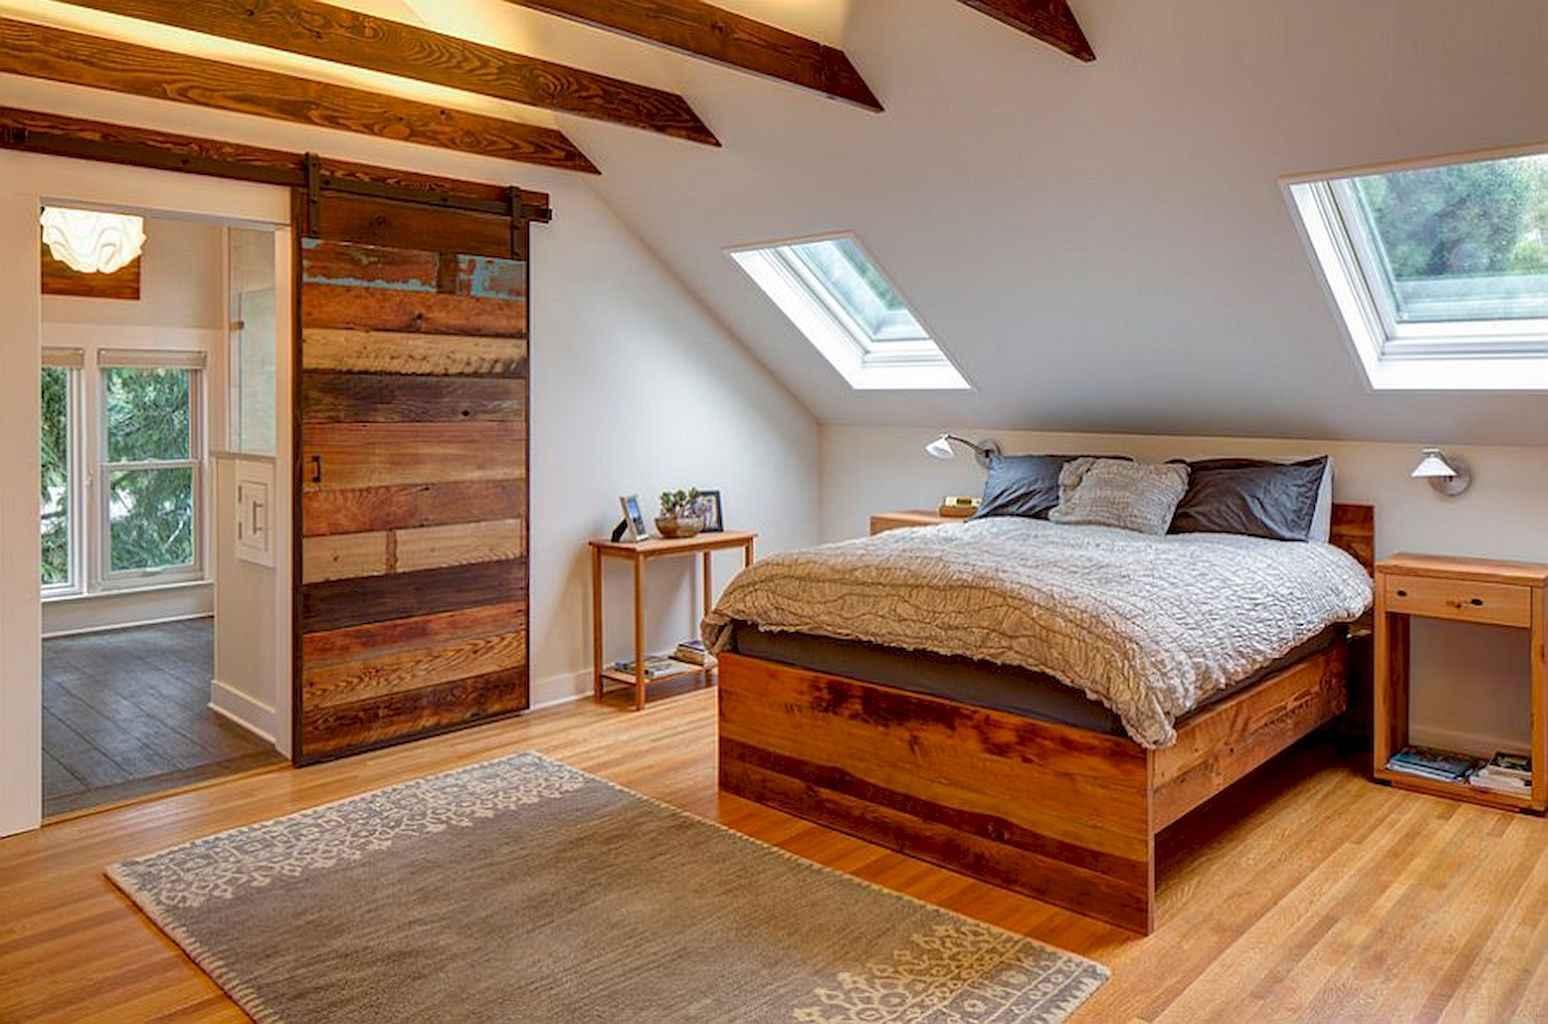 100 Stunning Farmhouse Master Bedroom Decor Ideas (19)